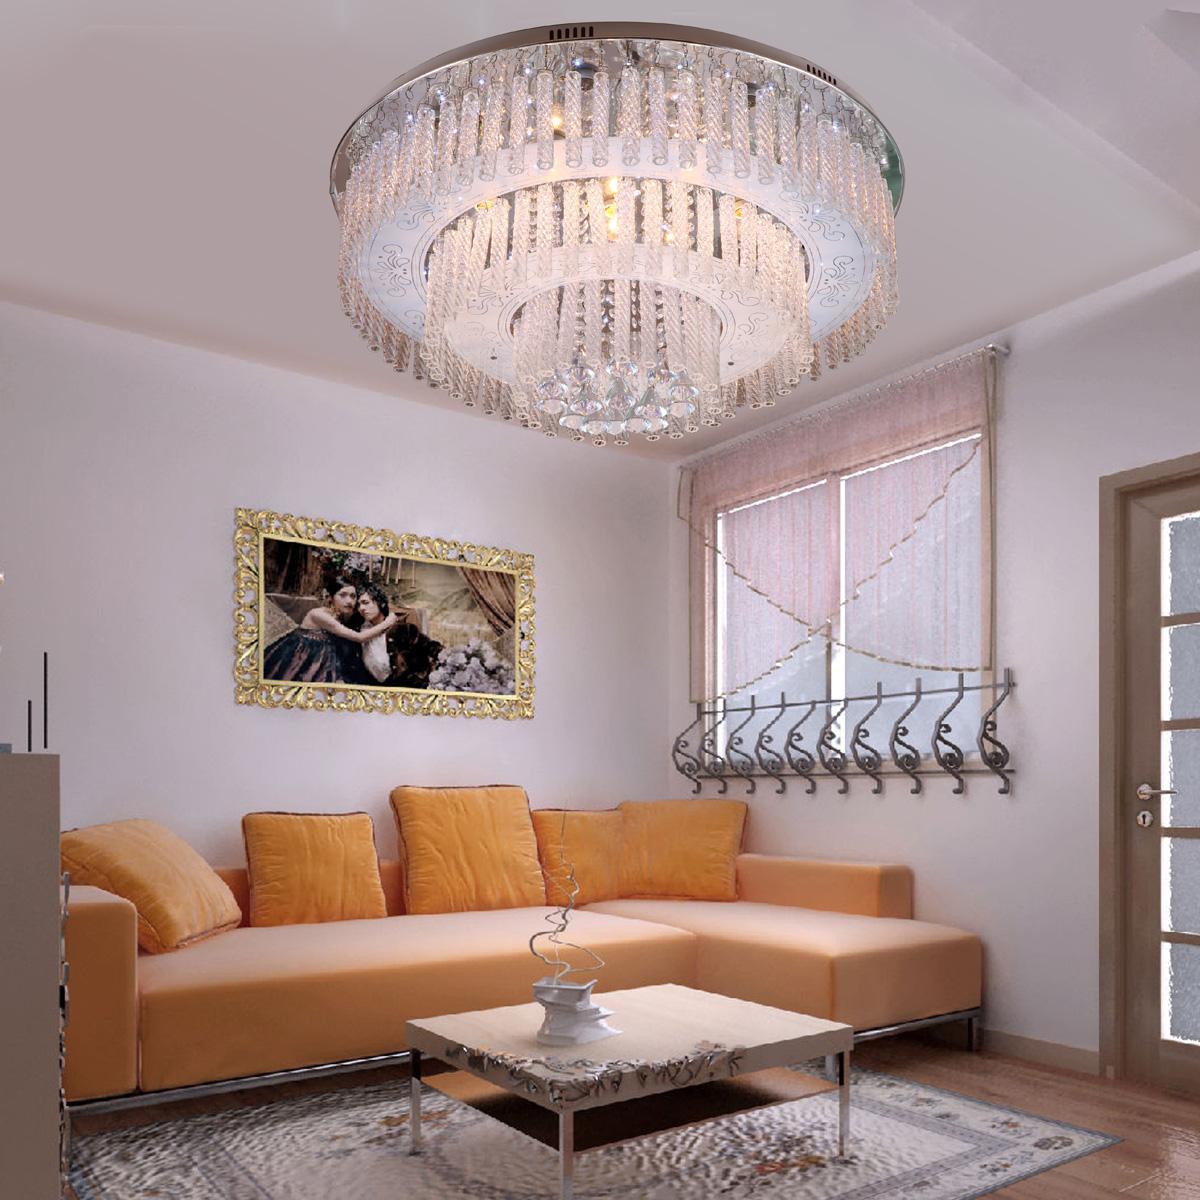 Flat Kitchen Ceiling Lights: Modern Brief Cake Type Crystal Ceiling Light Living Room